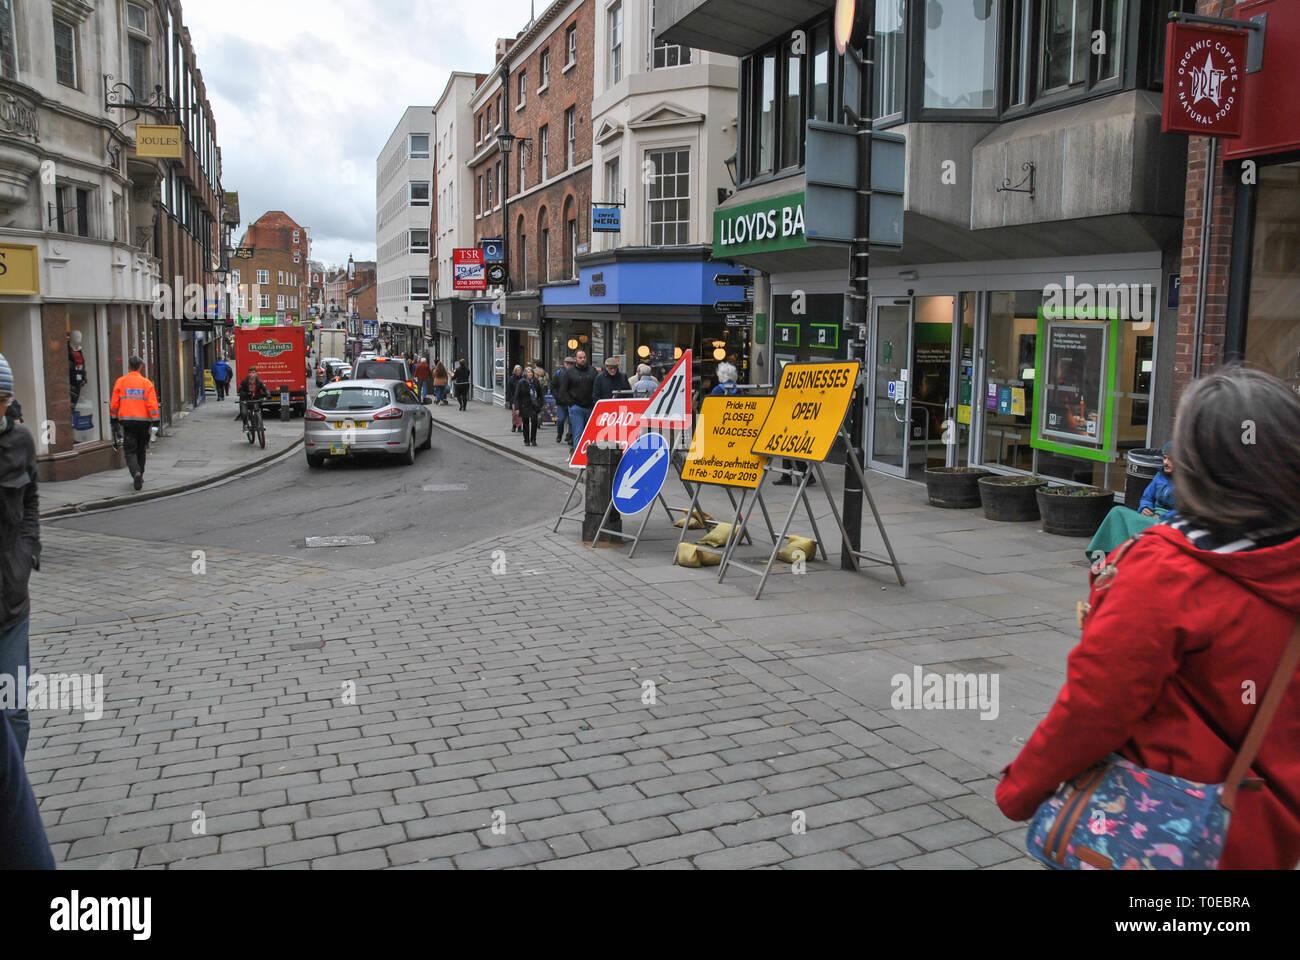 A busy street scene looking toward 'Shoplatch' in Shrewsbury - Stock Image